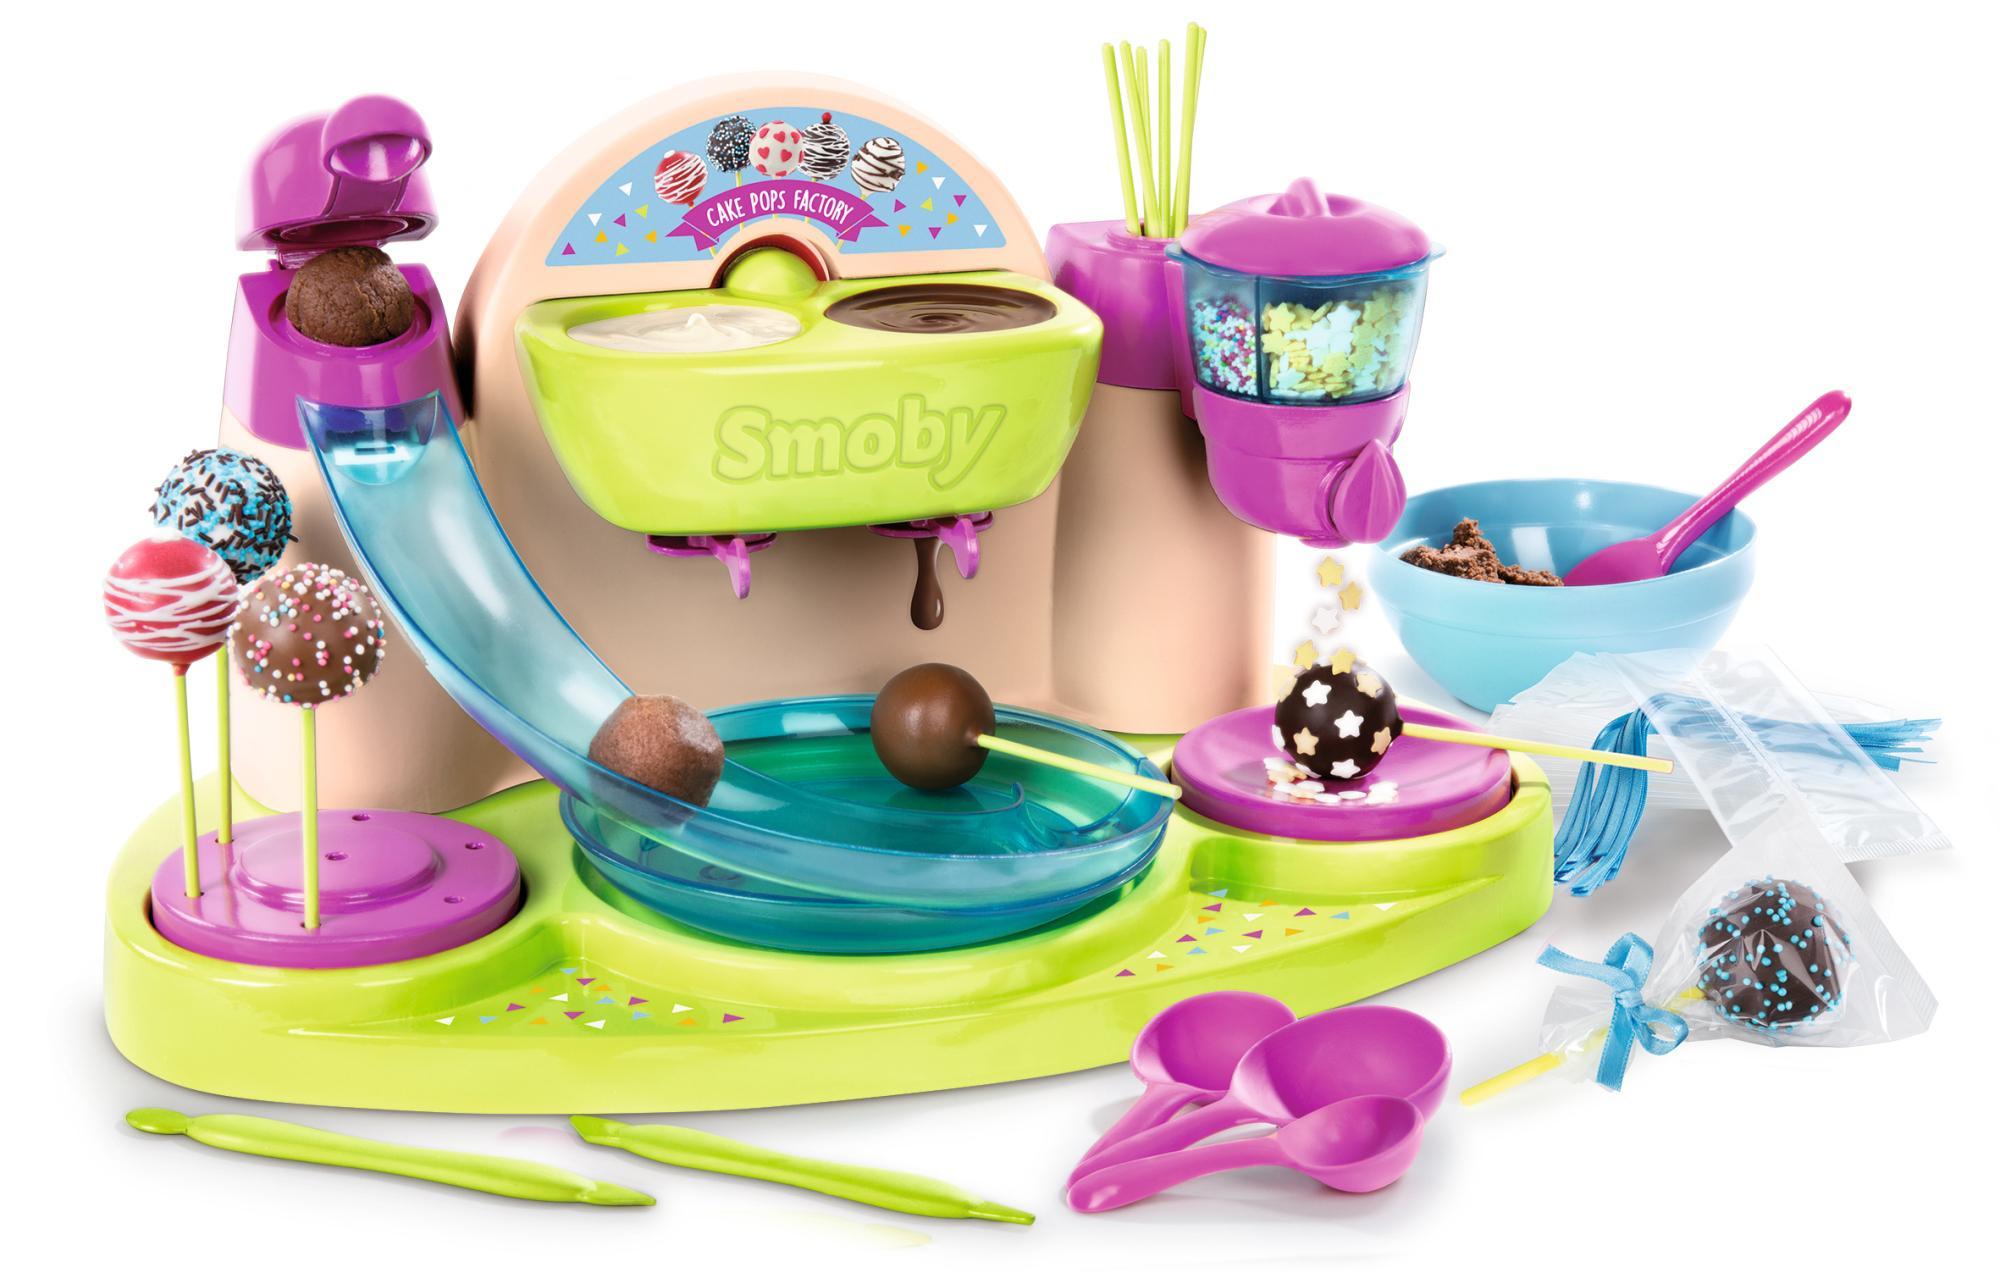 Smoby 312103 - Cake Pop Bäckerei: Amazon.de: Spielzeug